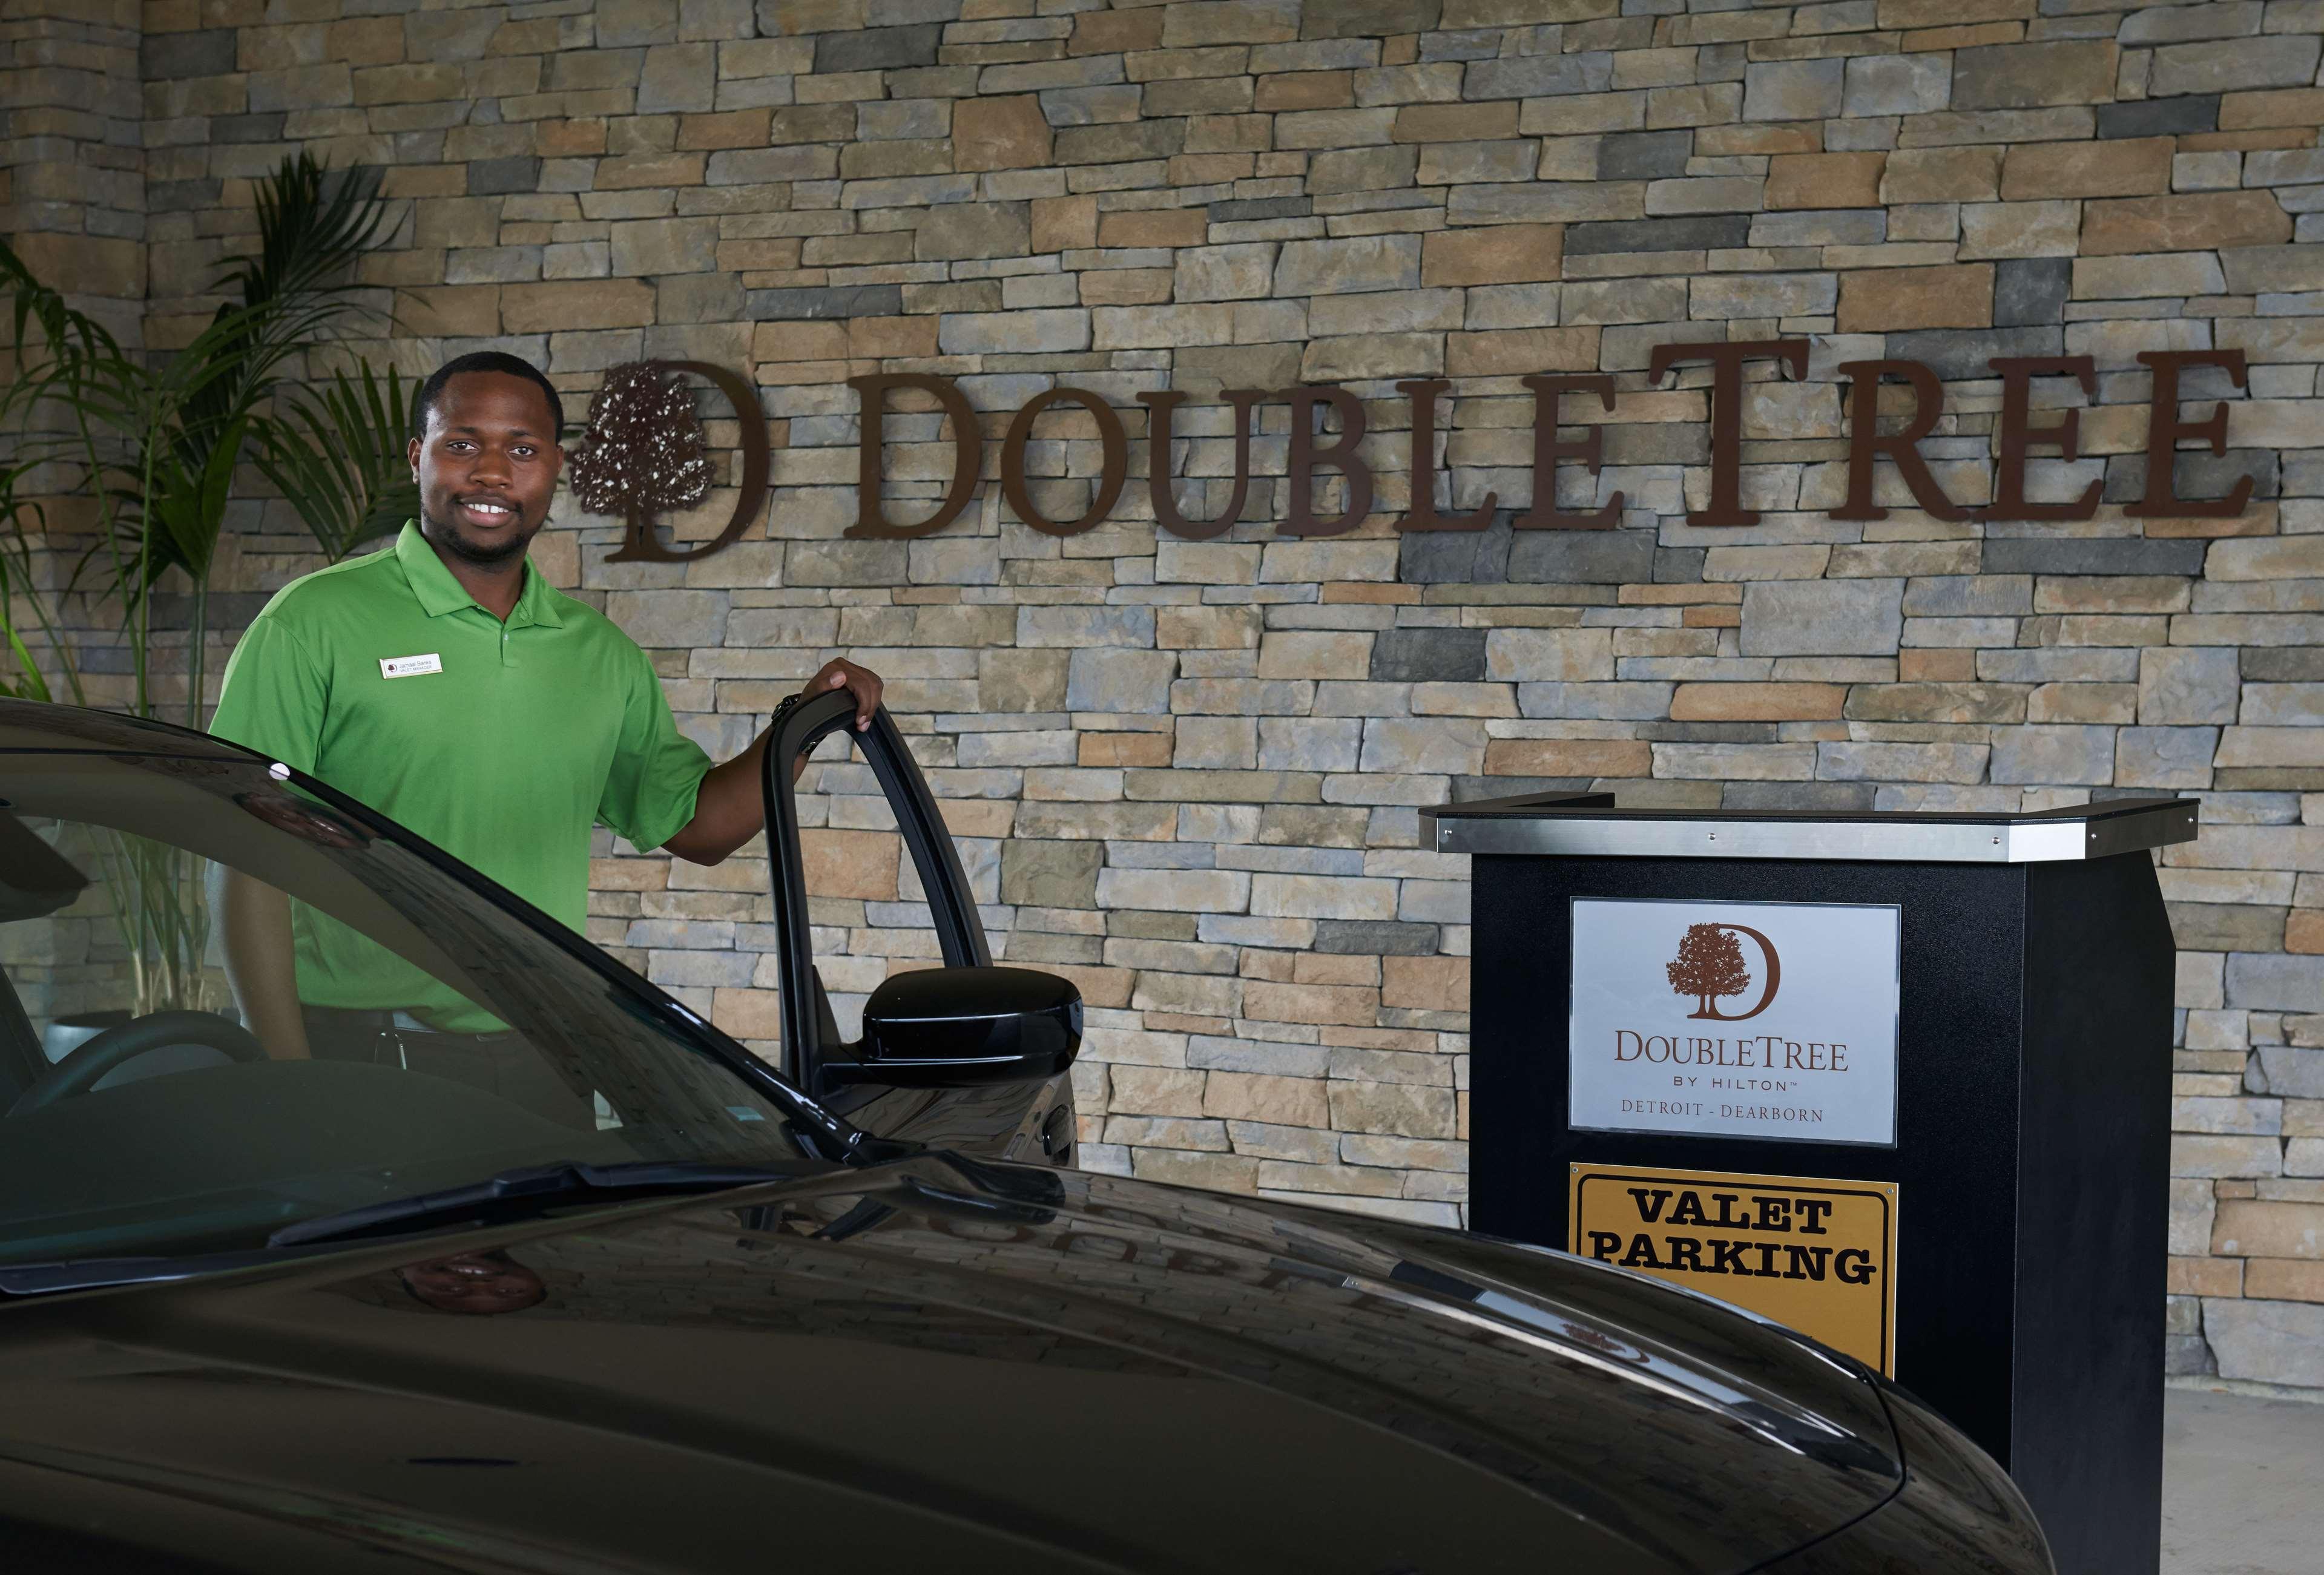 DoubleTree by Hilton Hotel Detroit - Dearborn image 1